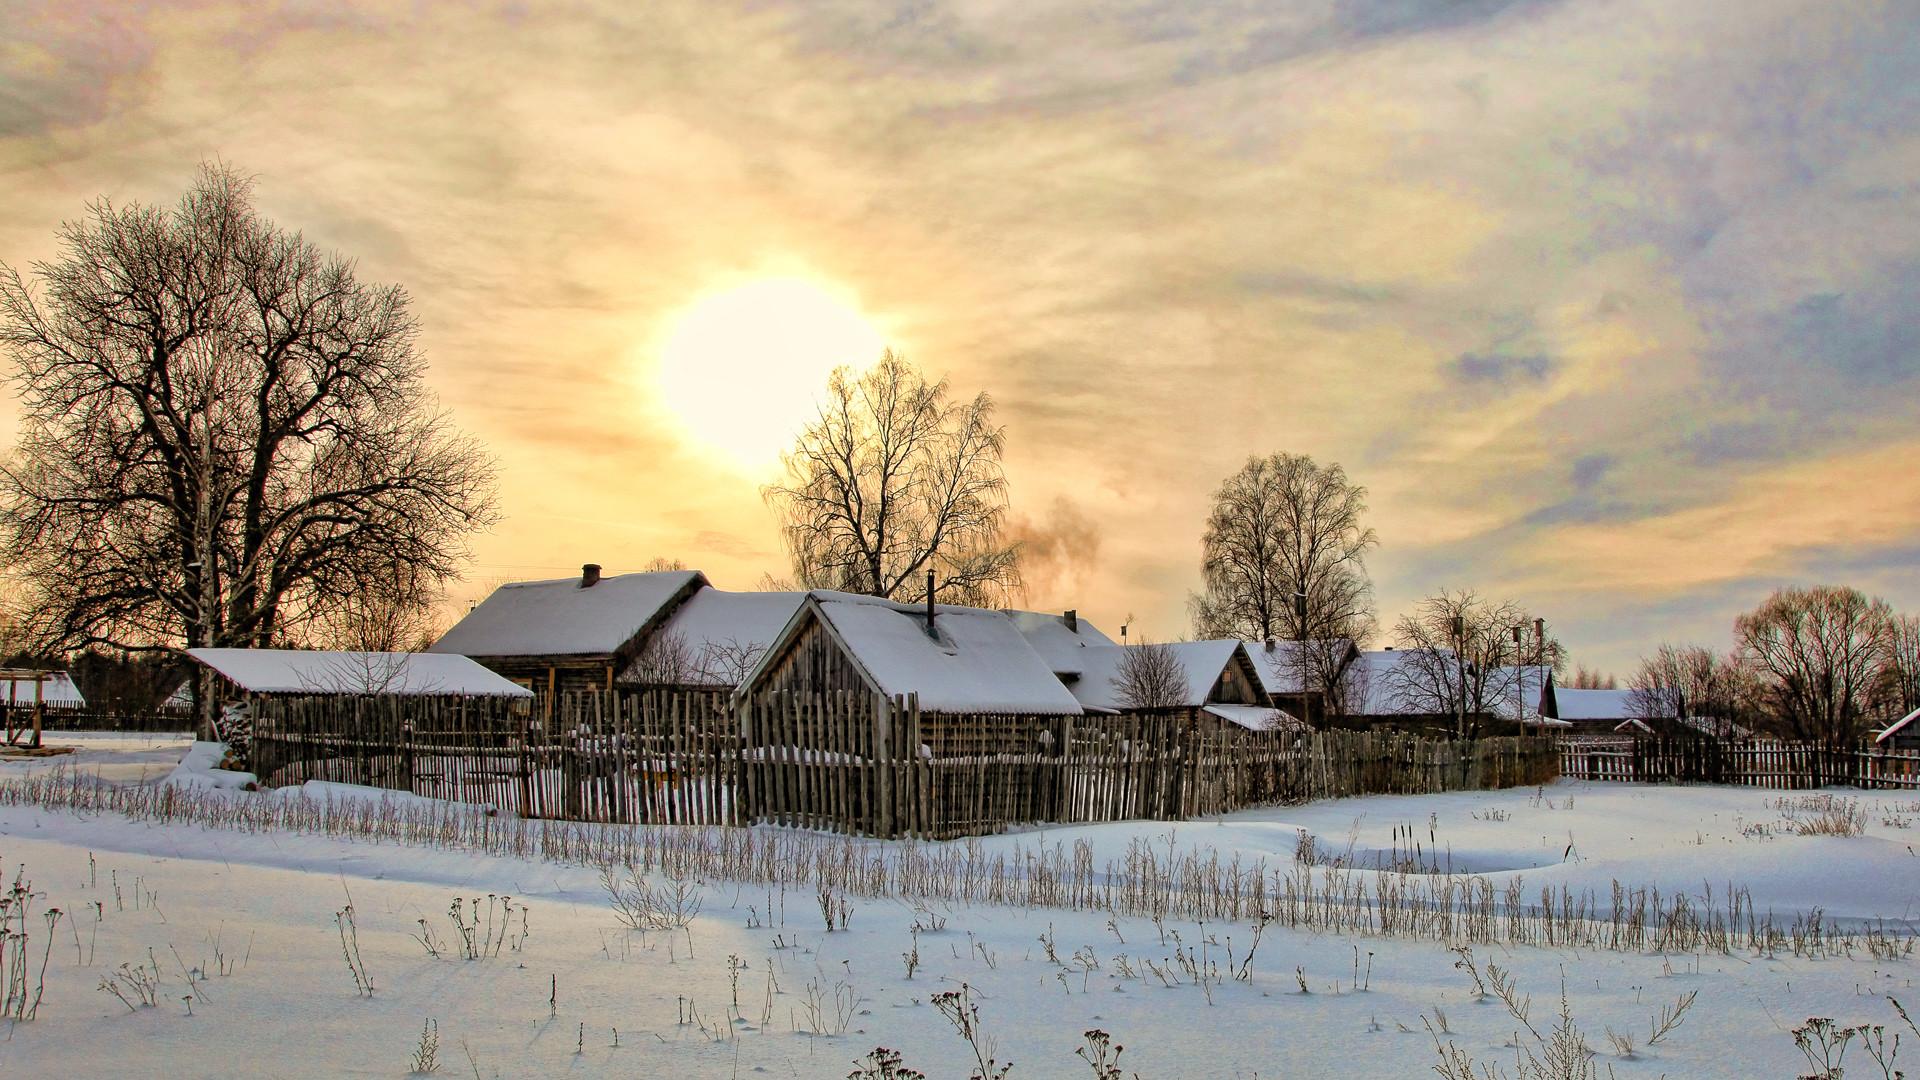 природа деревня дом снег зима забор мельница nature the village house snow winter fence mill без смс